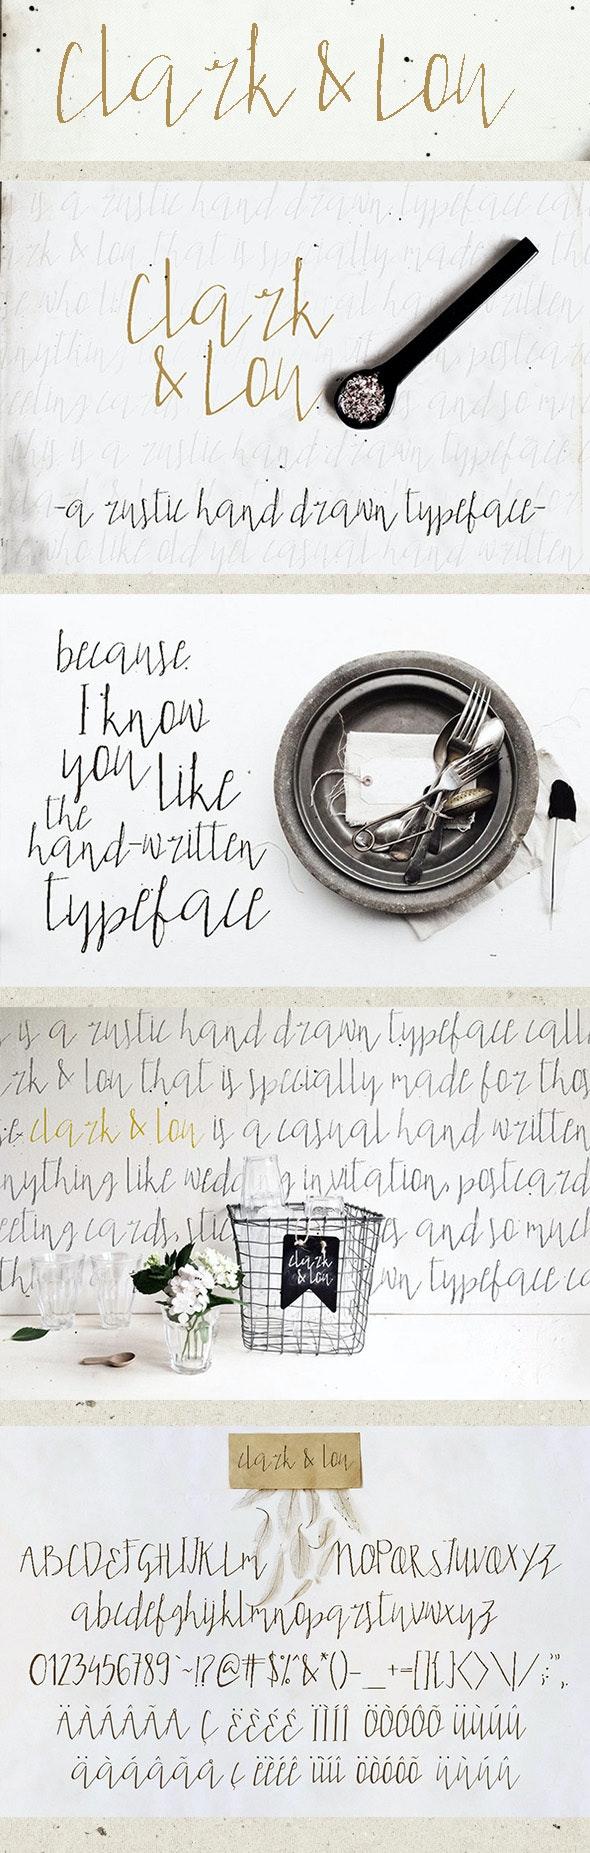 Clark & Lou - Hand-writing Script